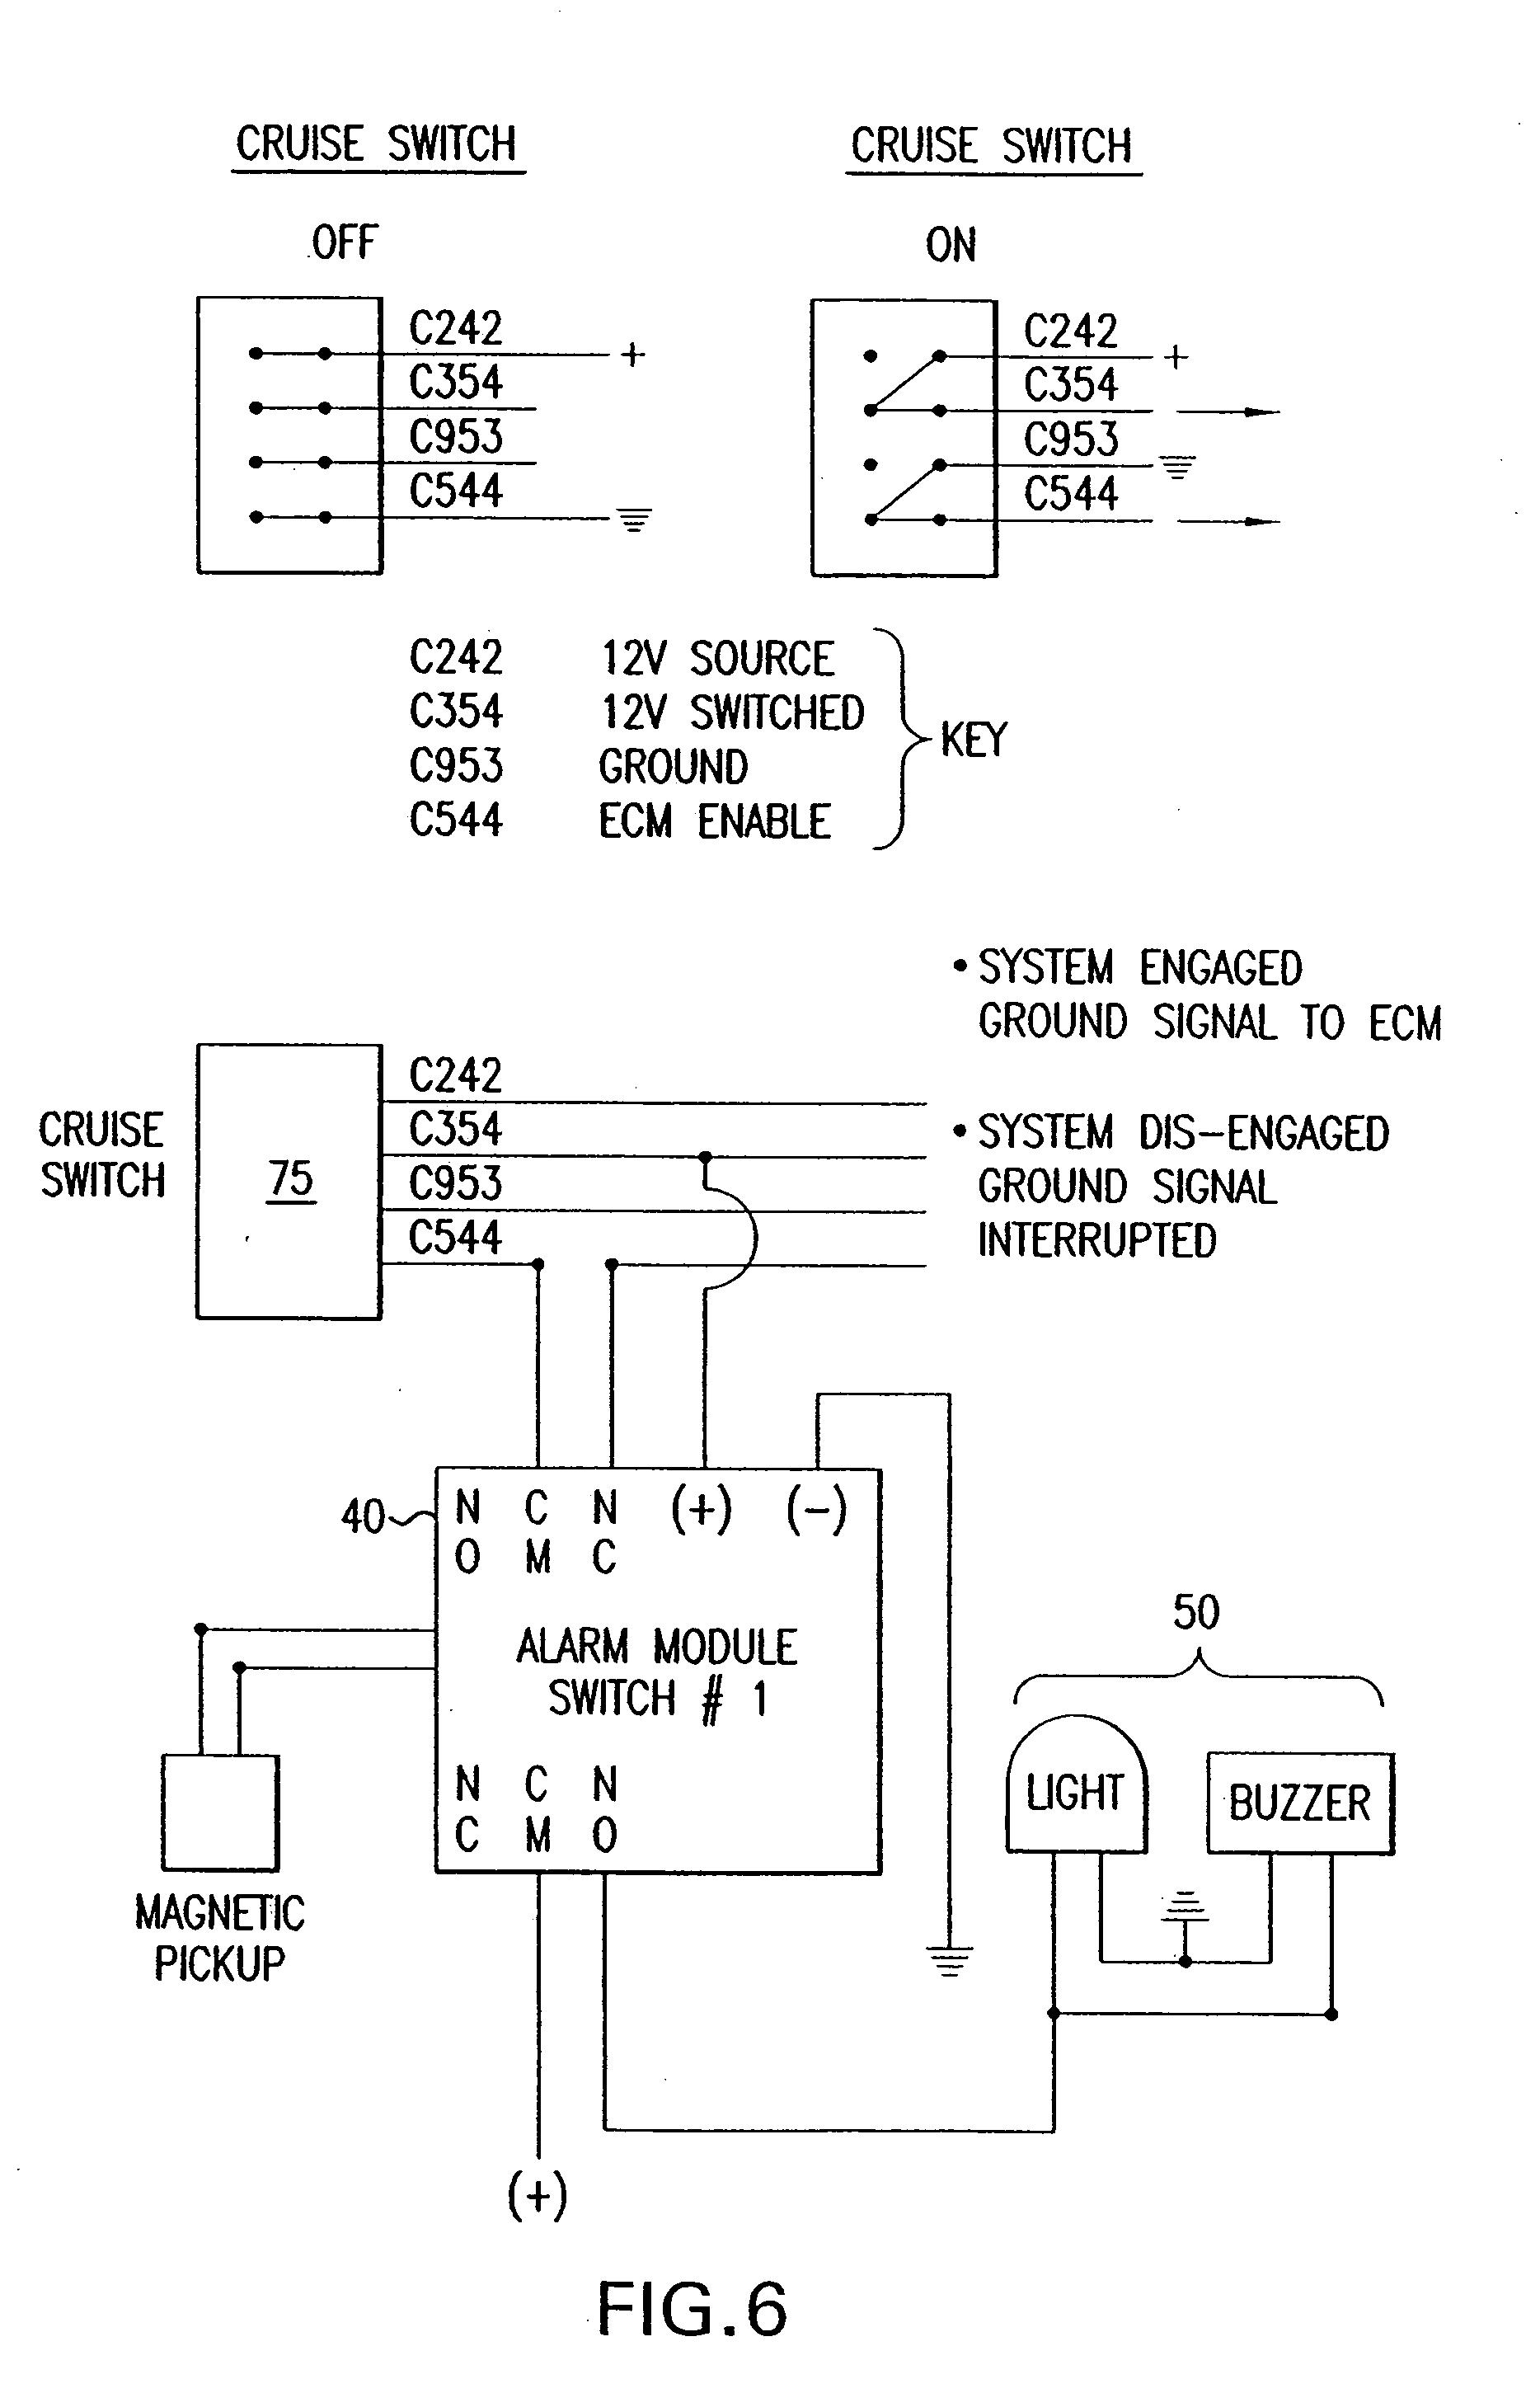 key switch wiring diagram for peterbilt 379